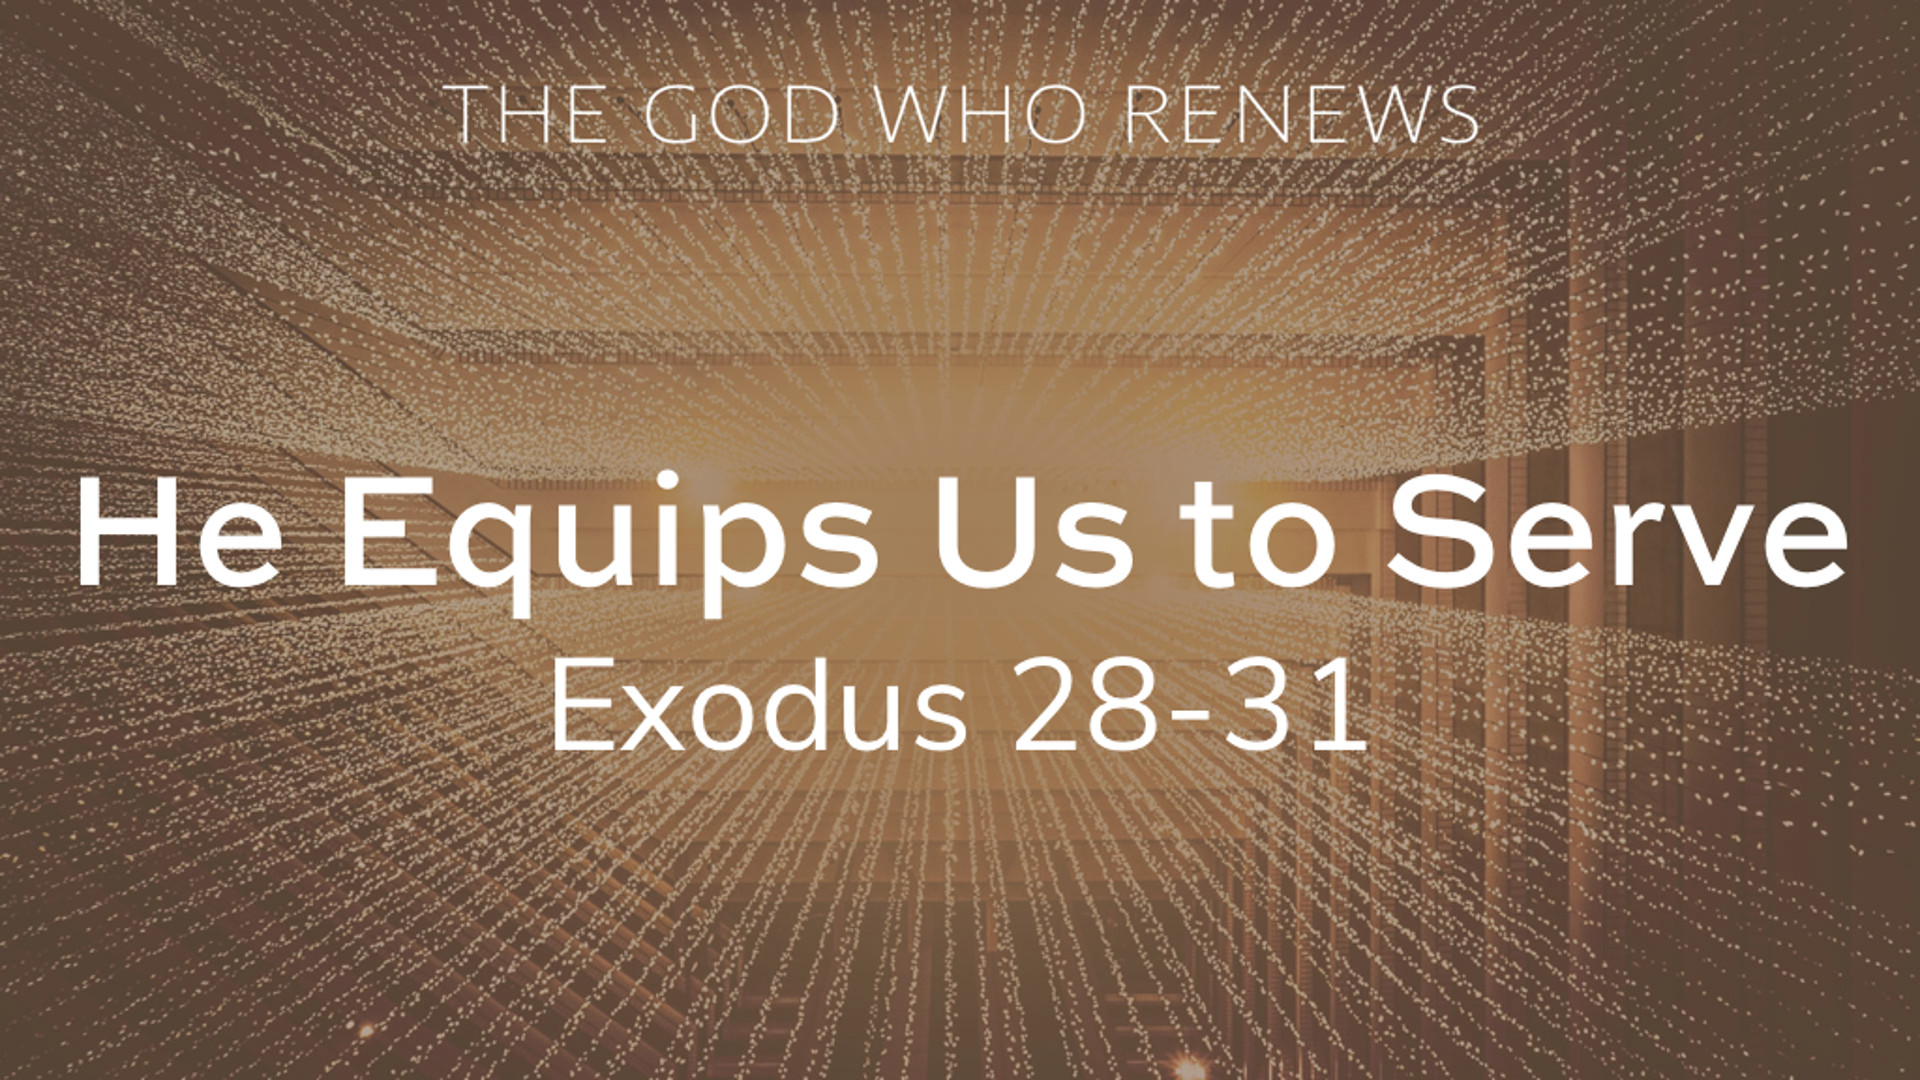 Exodus 28-31 - He Equips Us to Serve.jpg